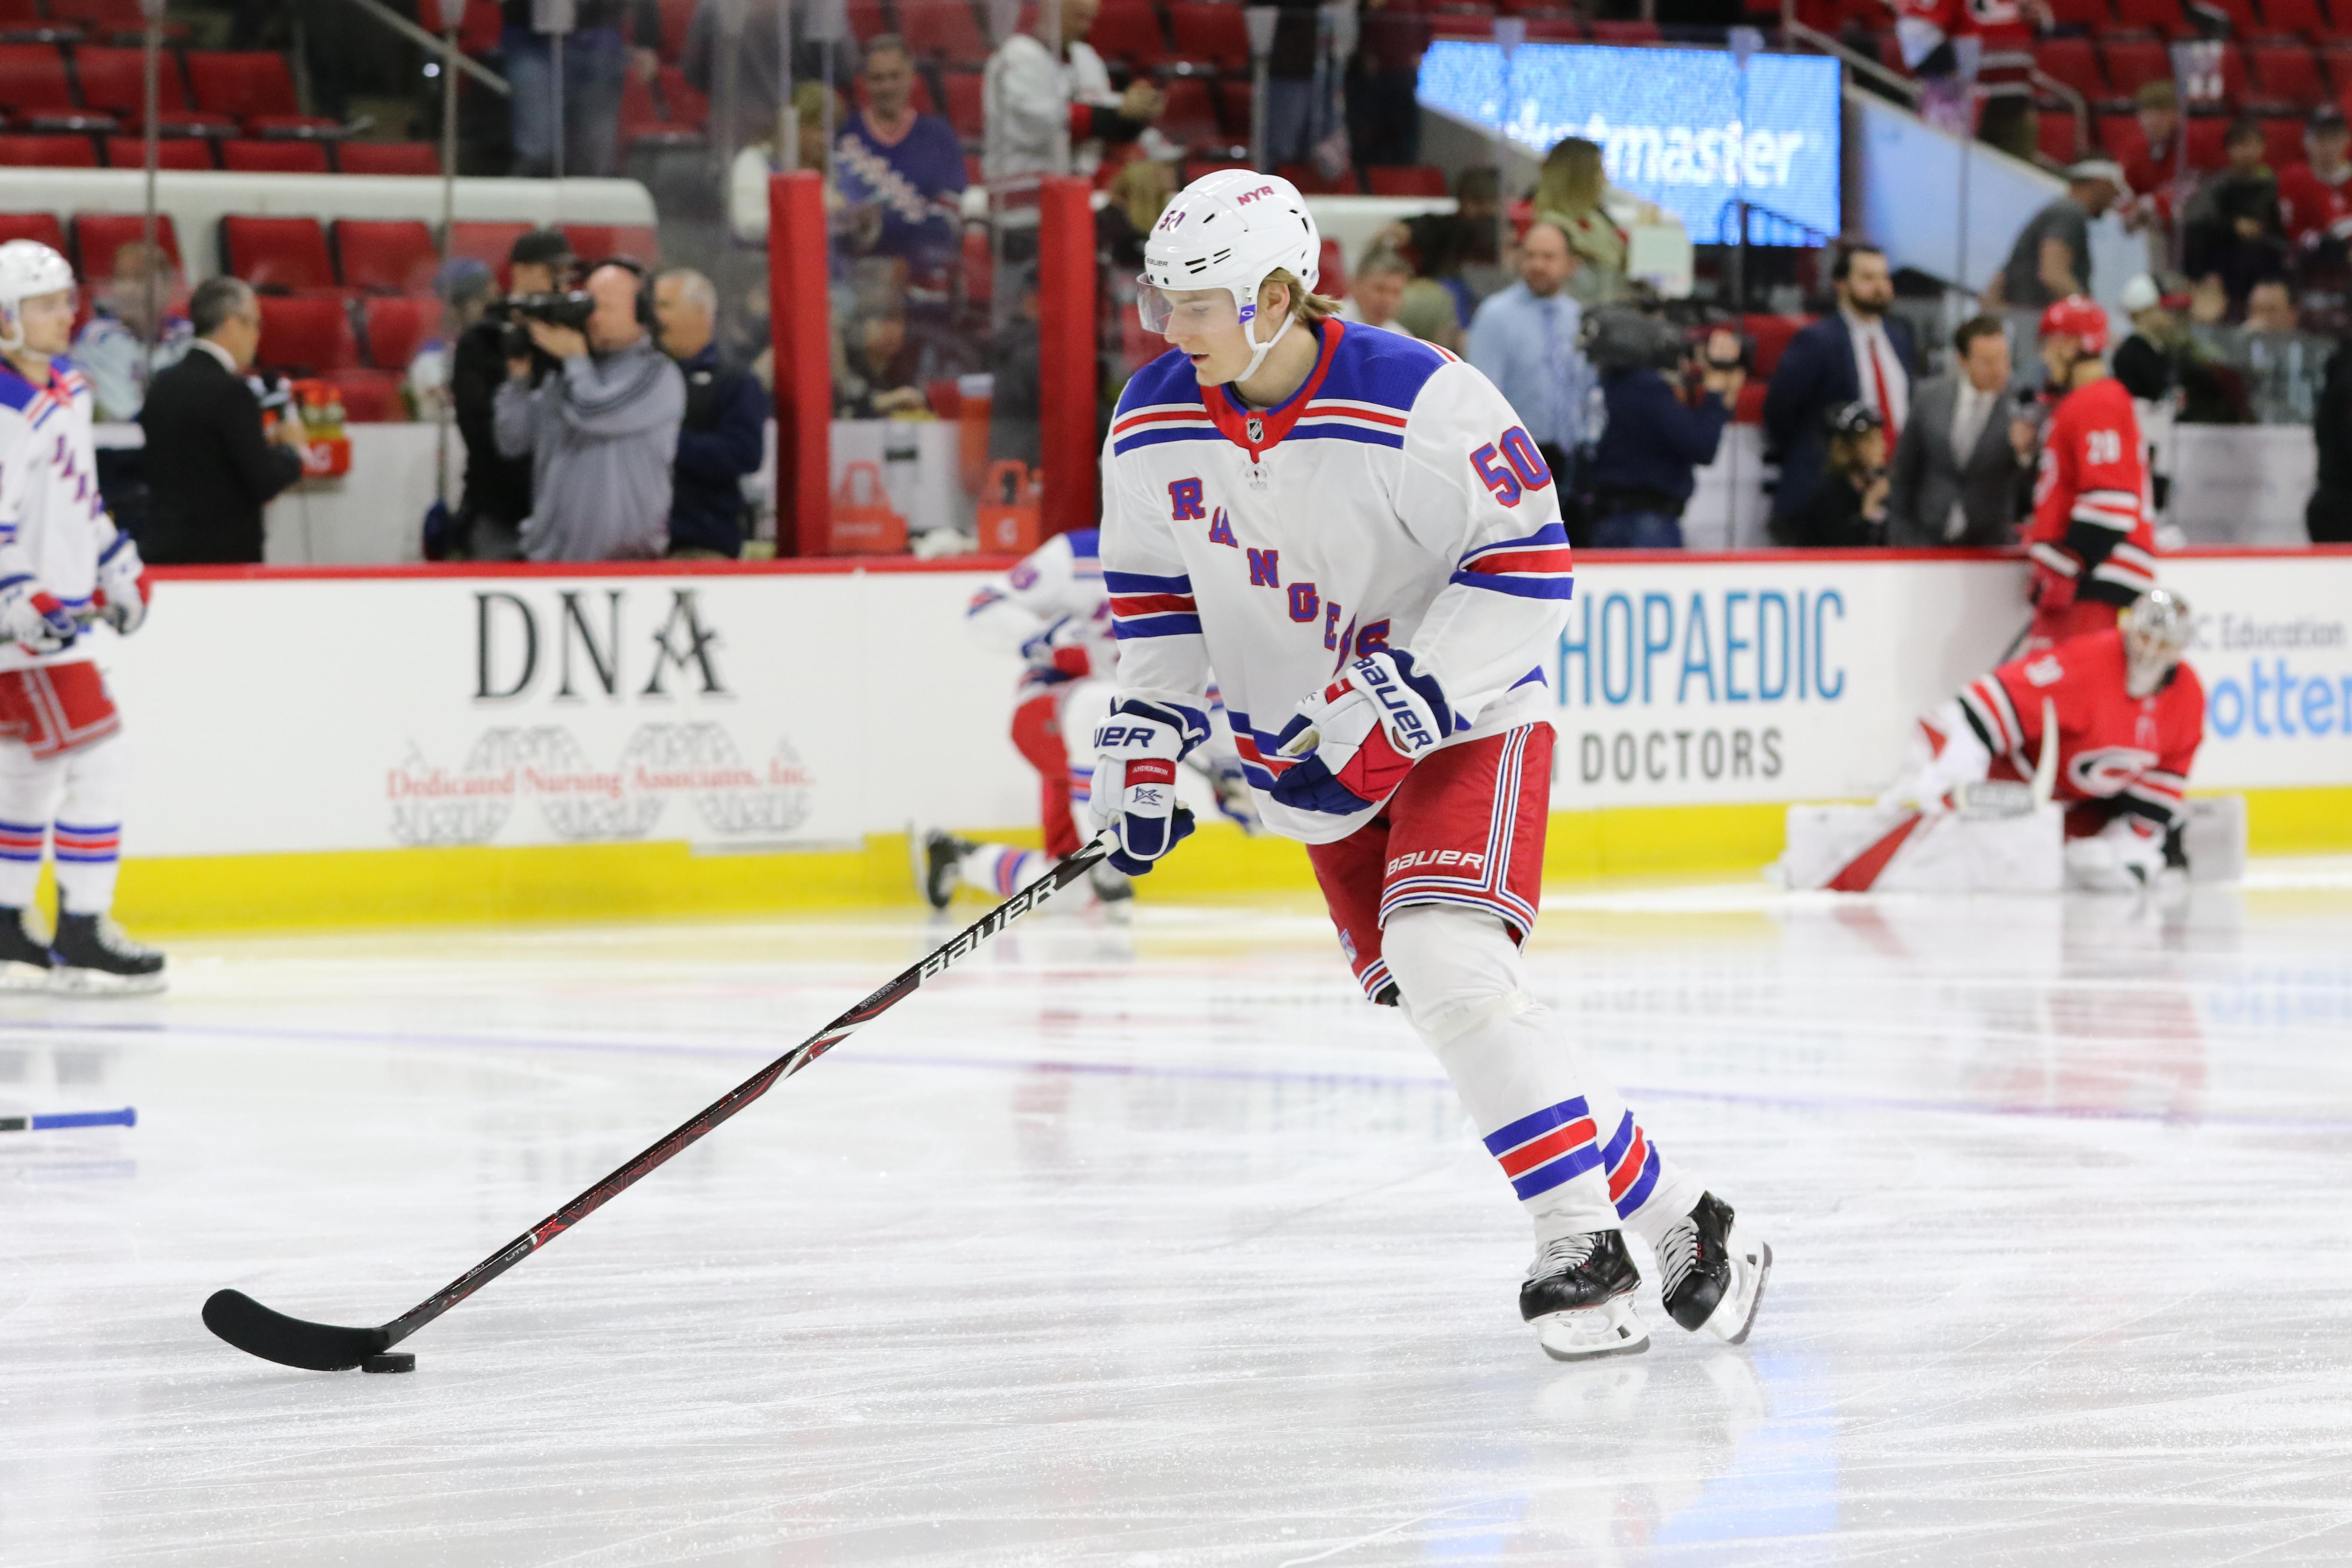 NHL: MAR 31 Rangers at Hurricanes